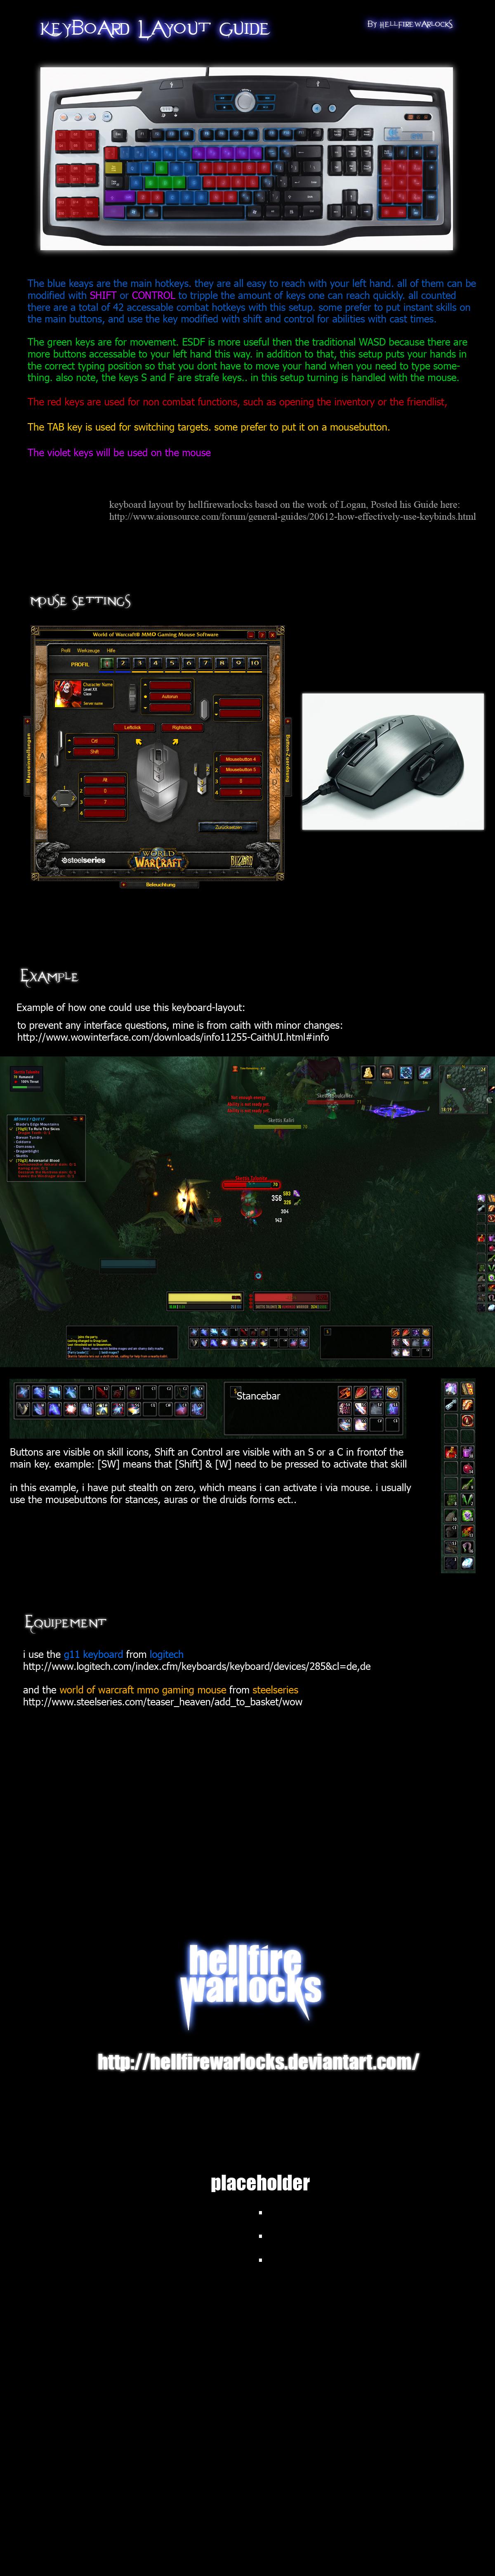 MMO Keyboard Layout Guide by HellfireWarlocks